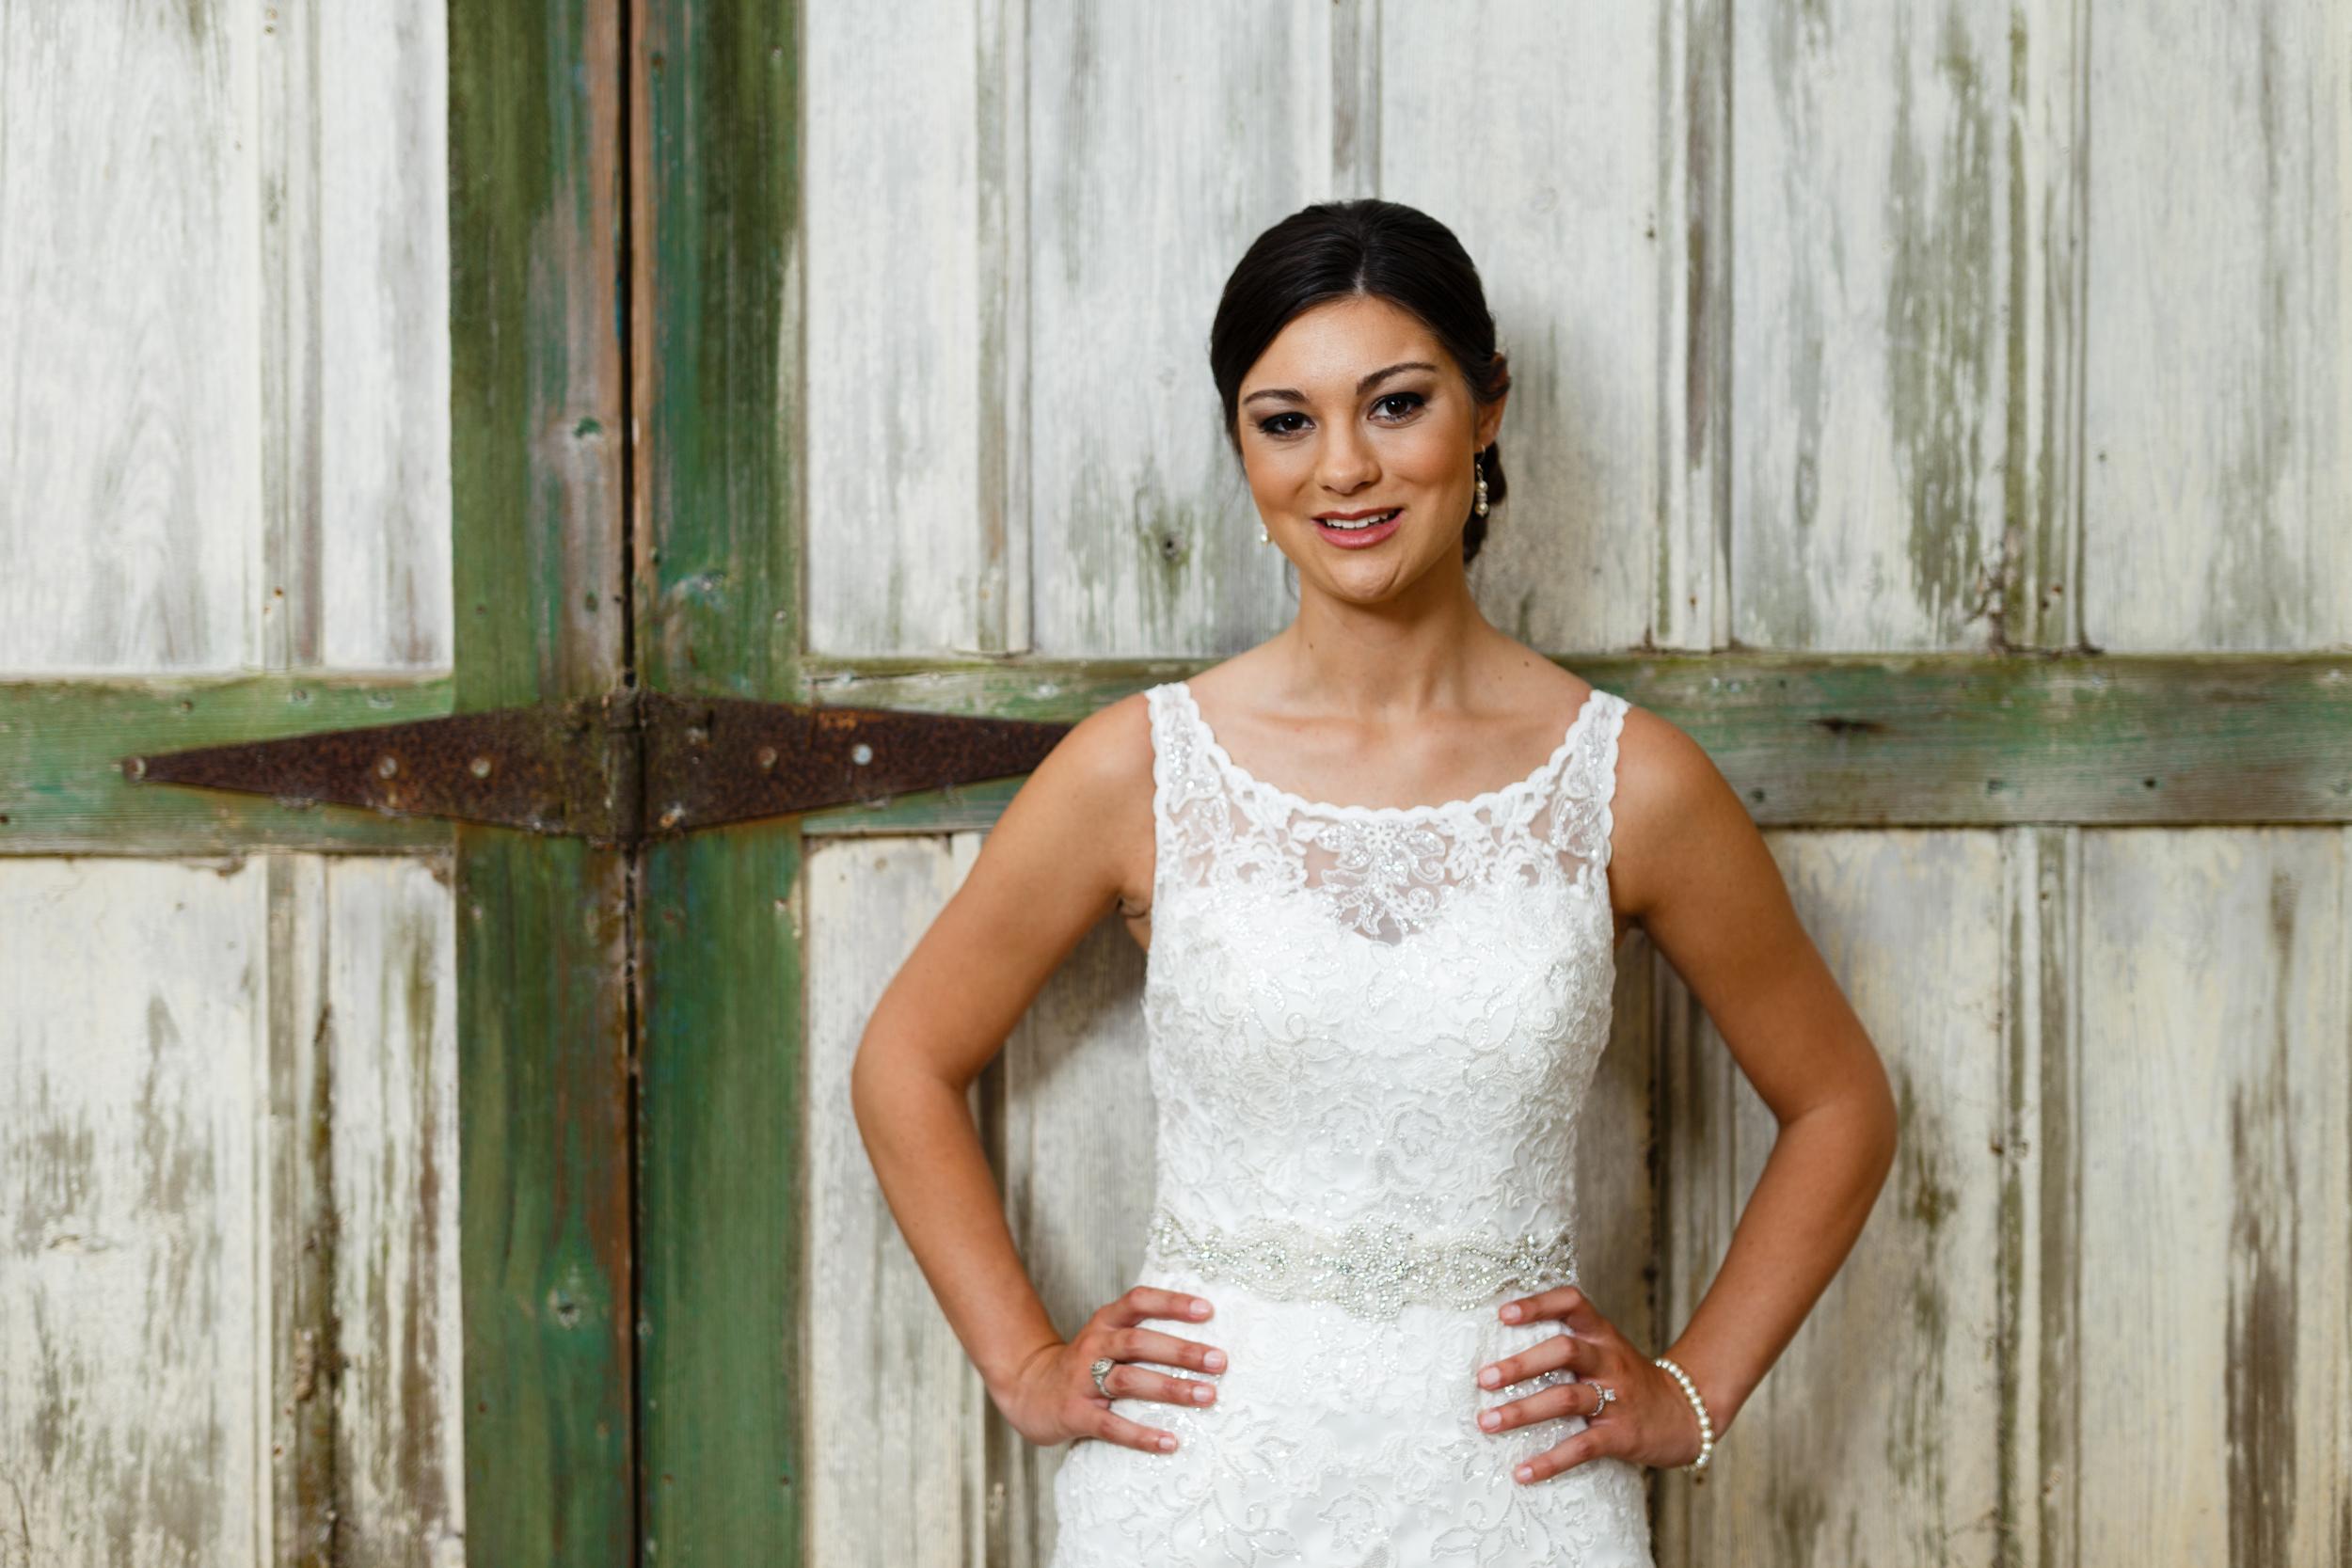 Bridal-wedding-portrait-lafayette-broussard-youngsville-photographer-6 (9).jpg